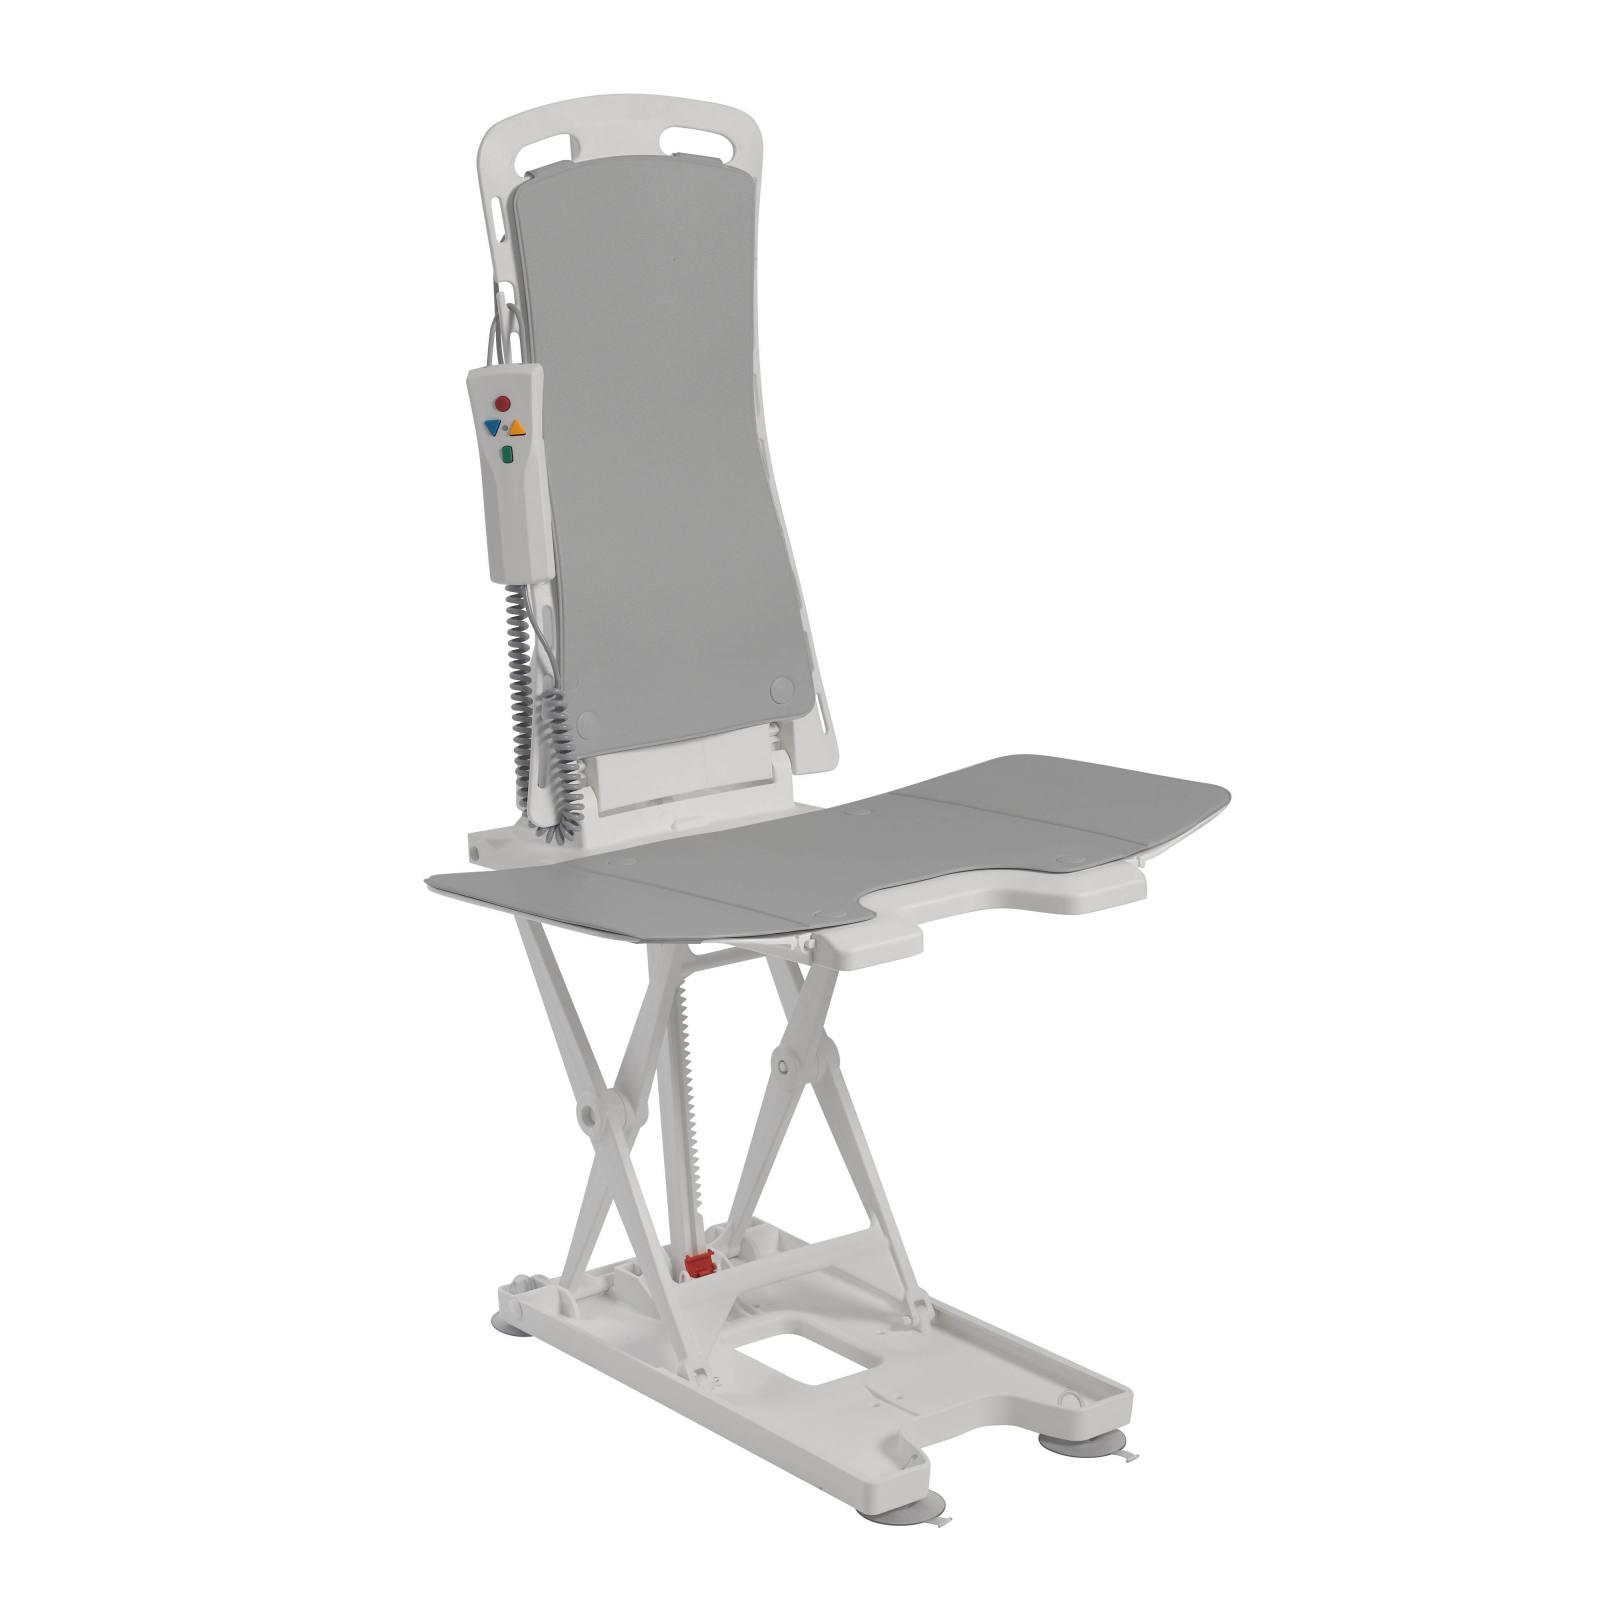 Drive Bellavita Auto Bath Tub Chair Seat Lift from Hawthorne Medical ...